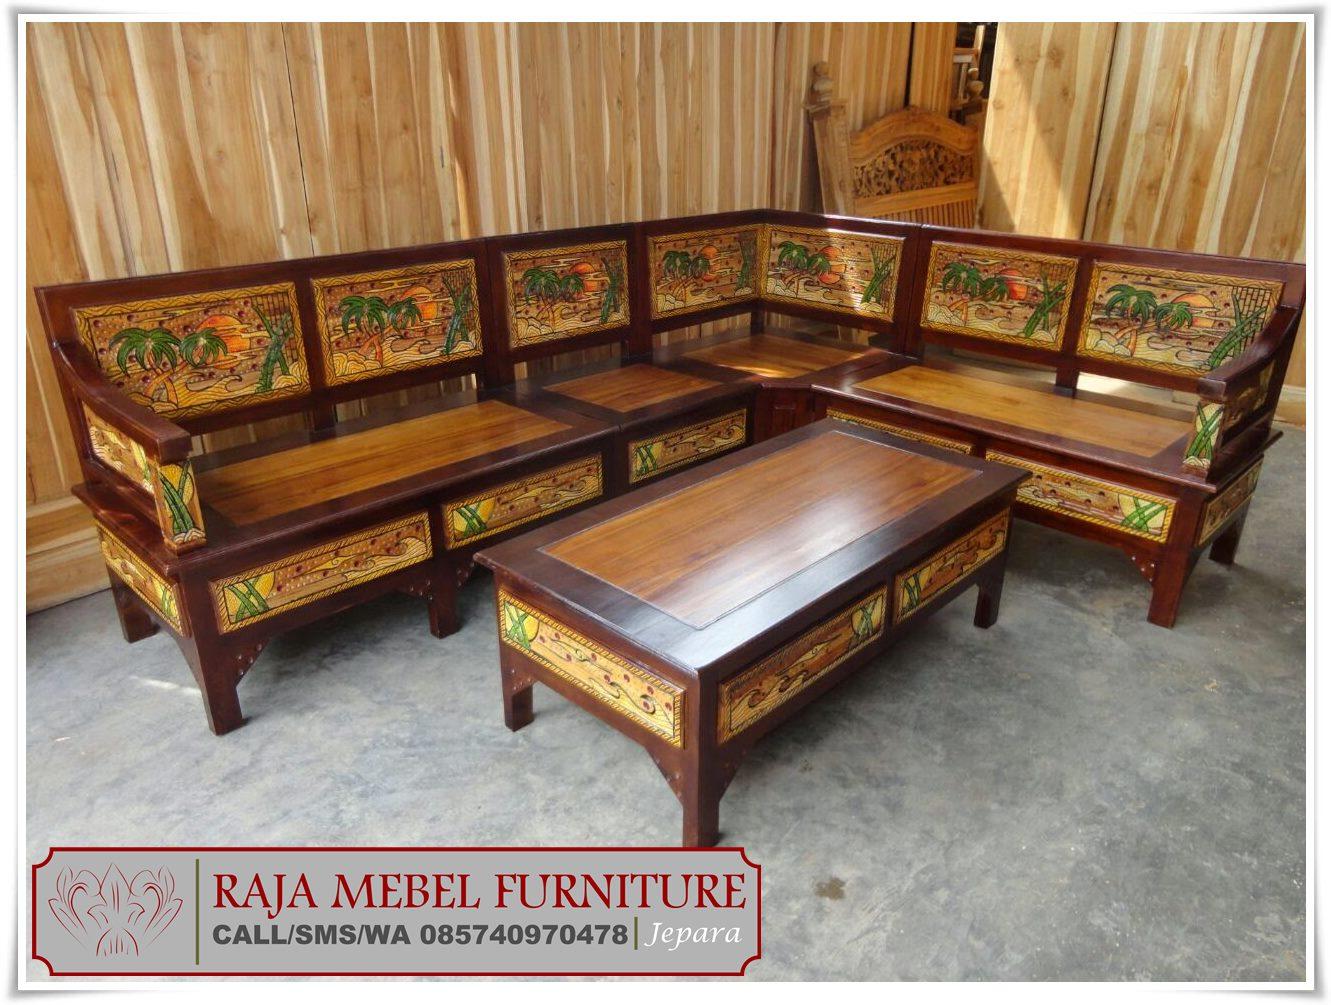 Kursi Tamu Sudut Minimalis Mewah Terbaru Jepara Raja Mebel Furniture